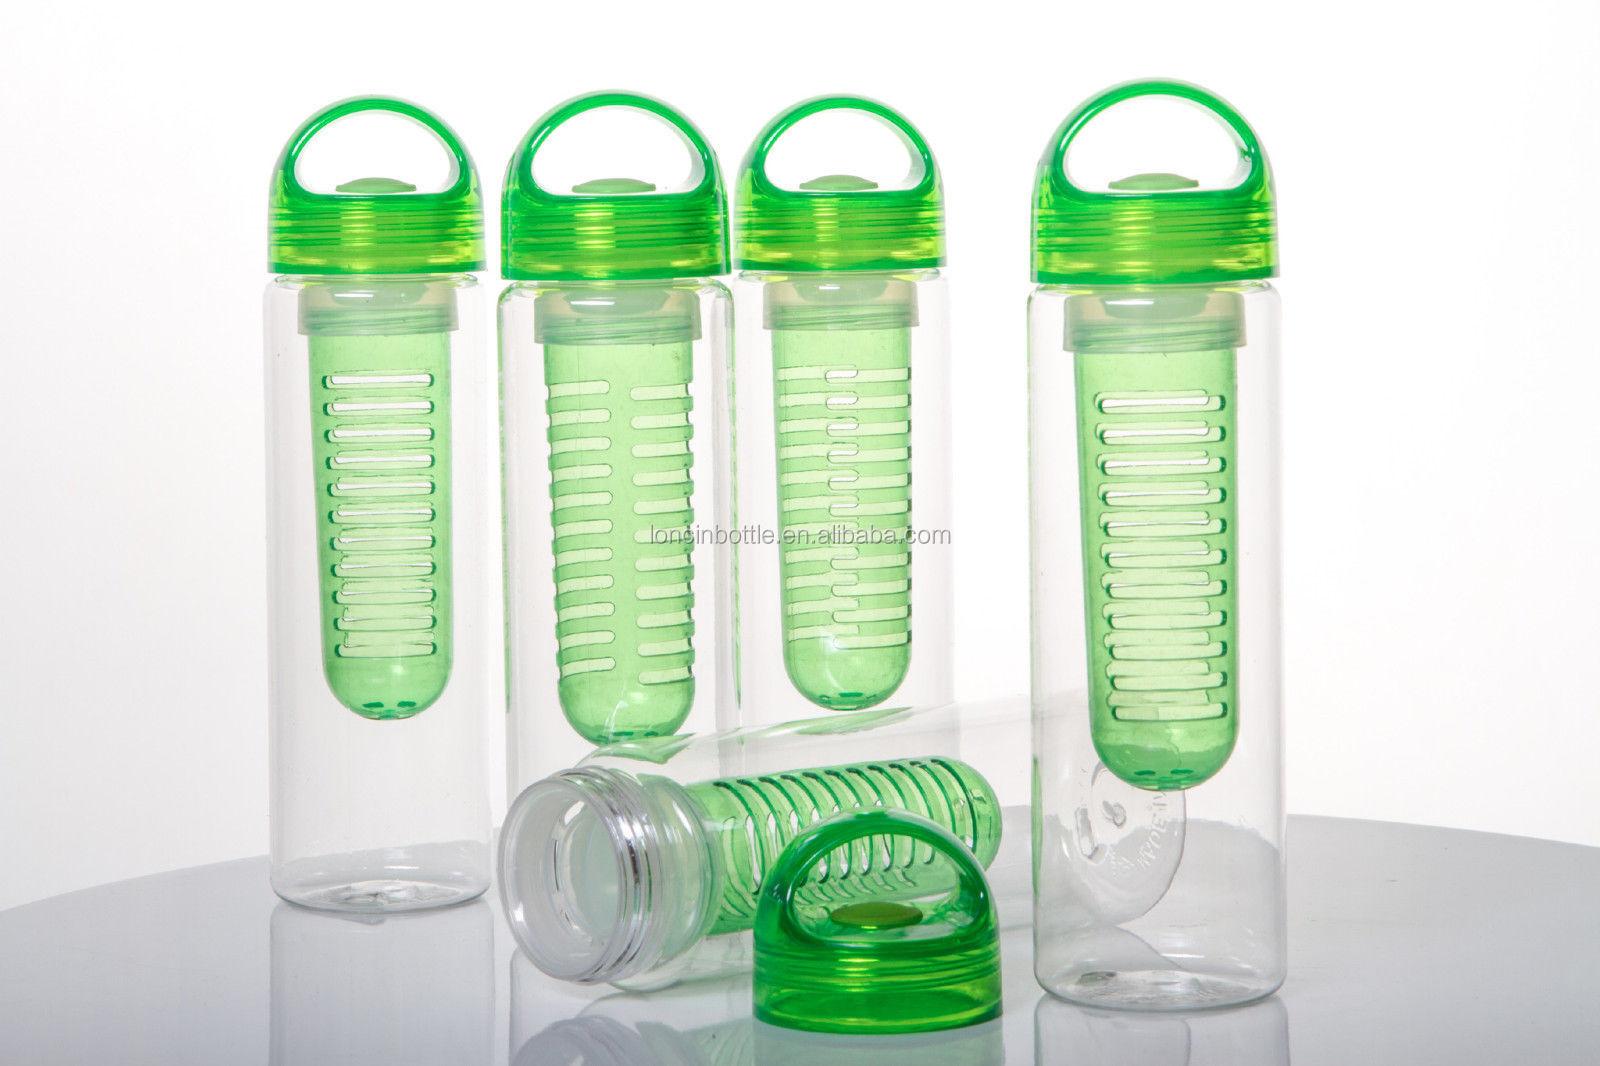 27oz Tritan Sports Water Bottle 24 Oz Insulated Fruit